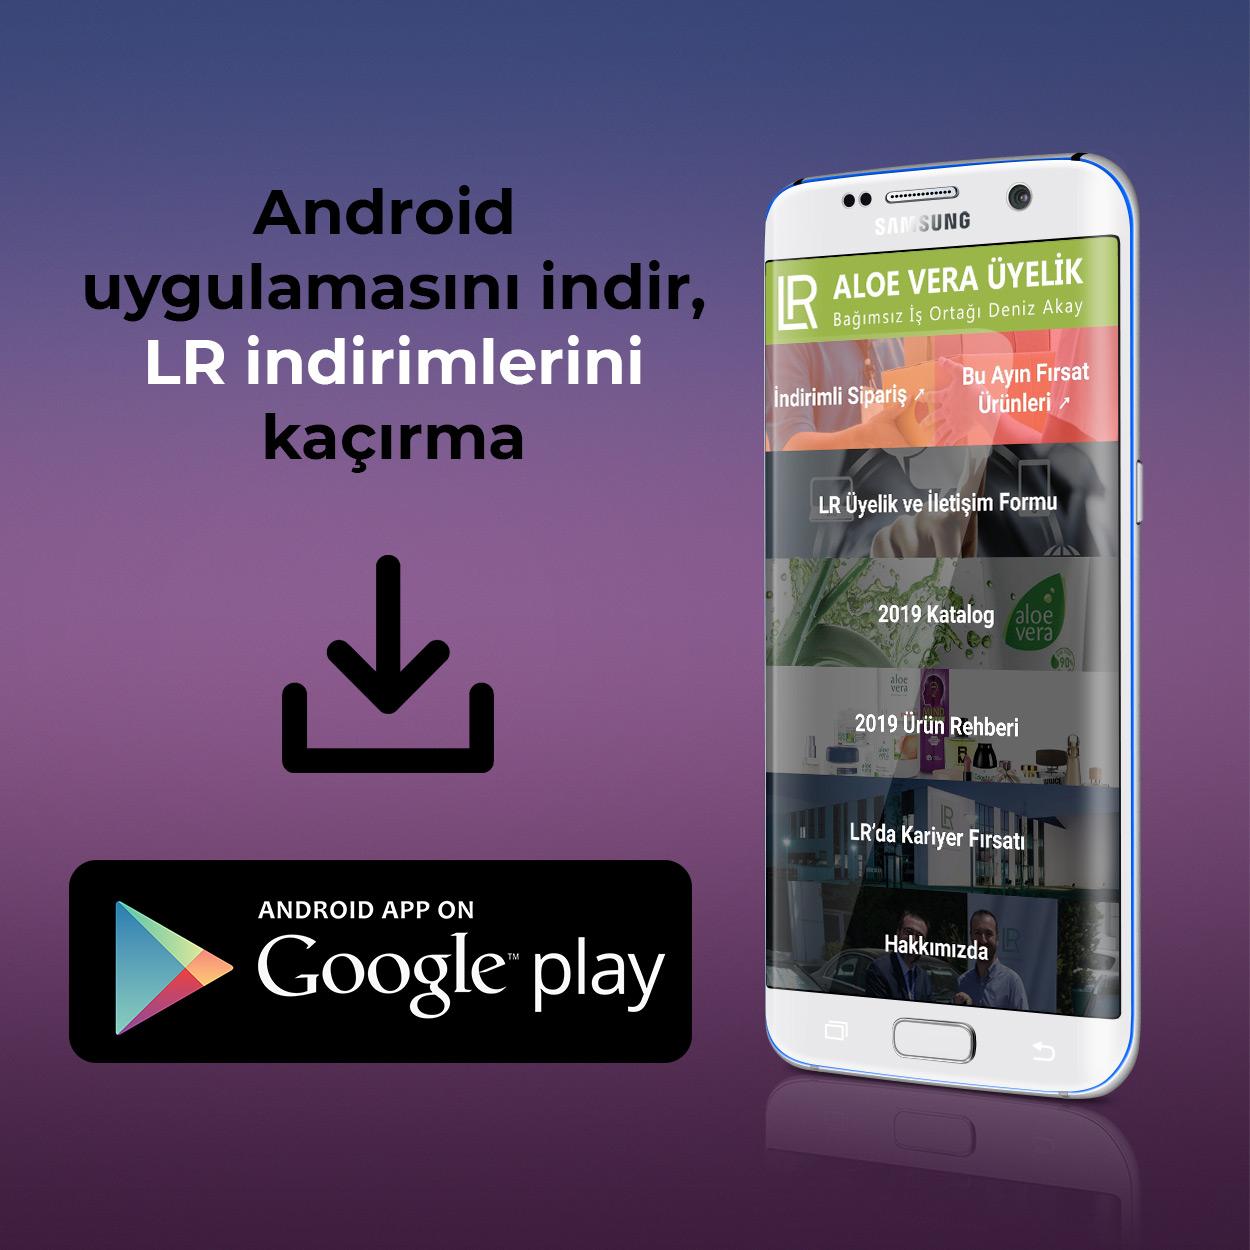 LR Aloe Vera Android Uygulamasi Indir